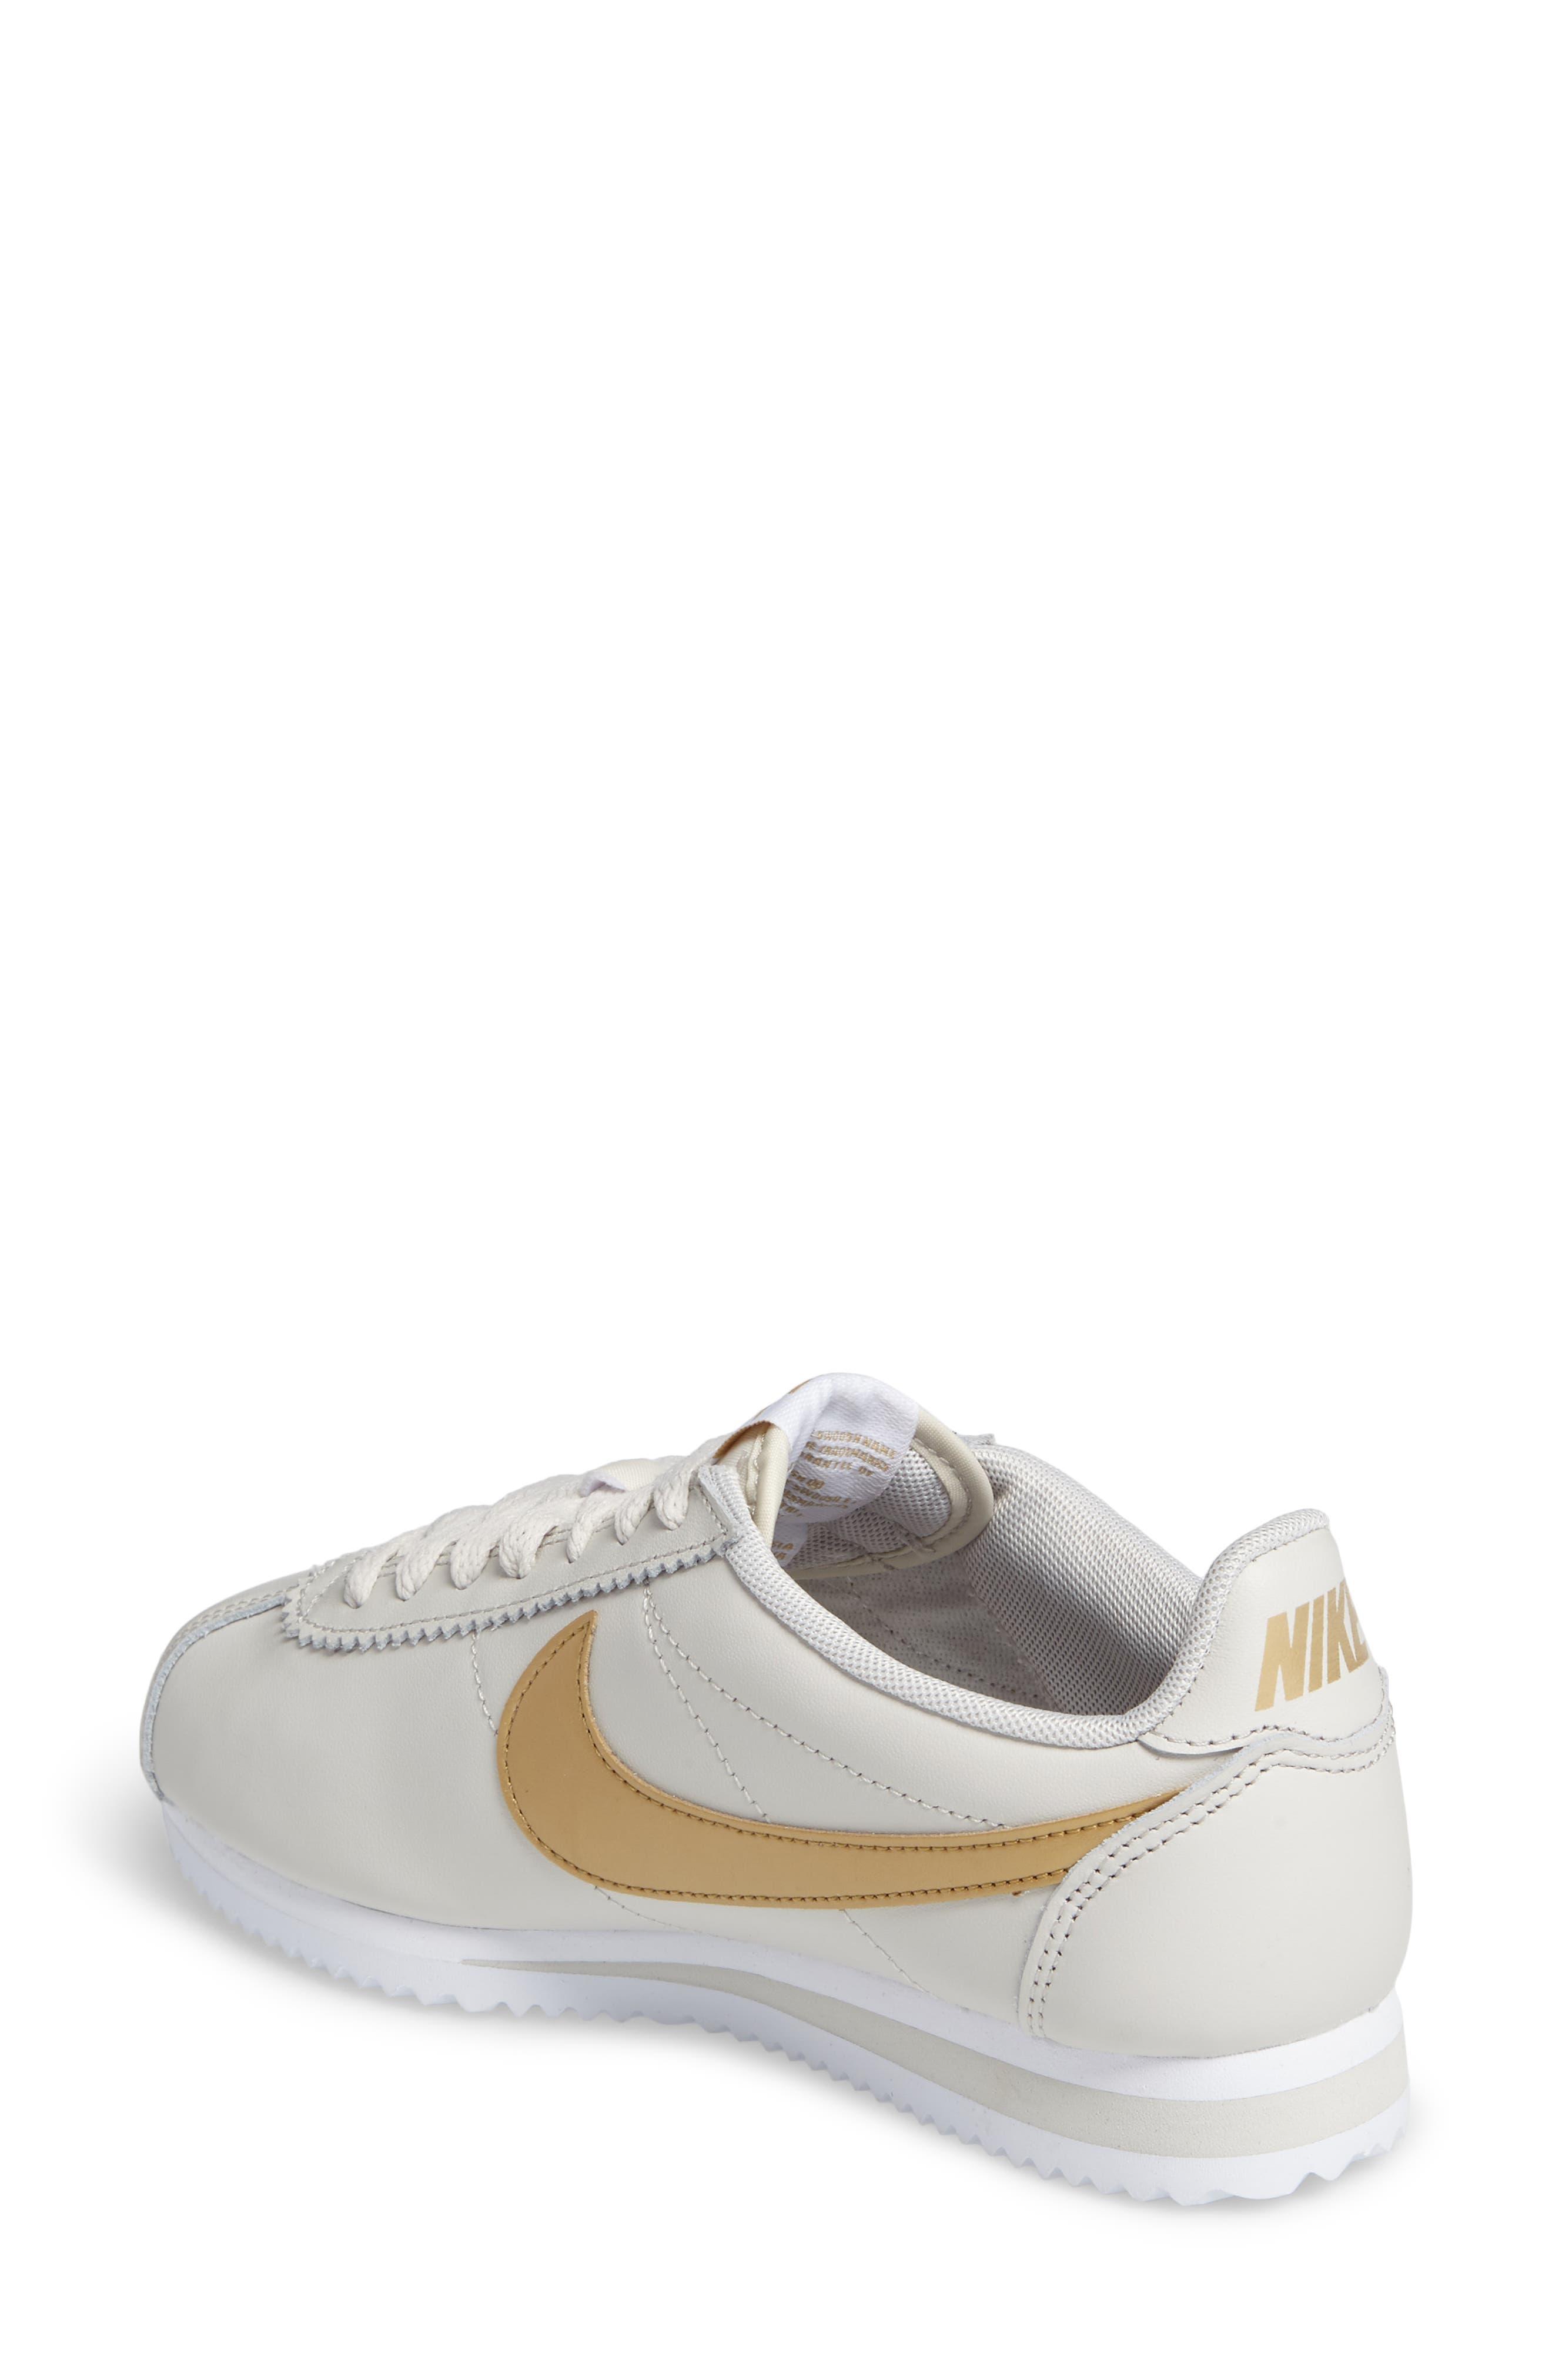 'Classic Cortez' Sneaker,                             Alternate thumbnail 4, color,                             Bone